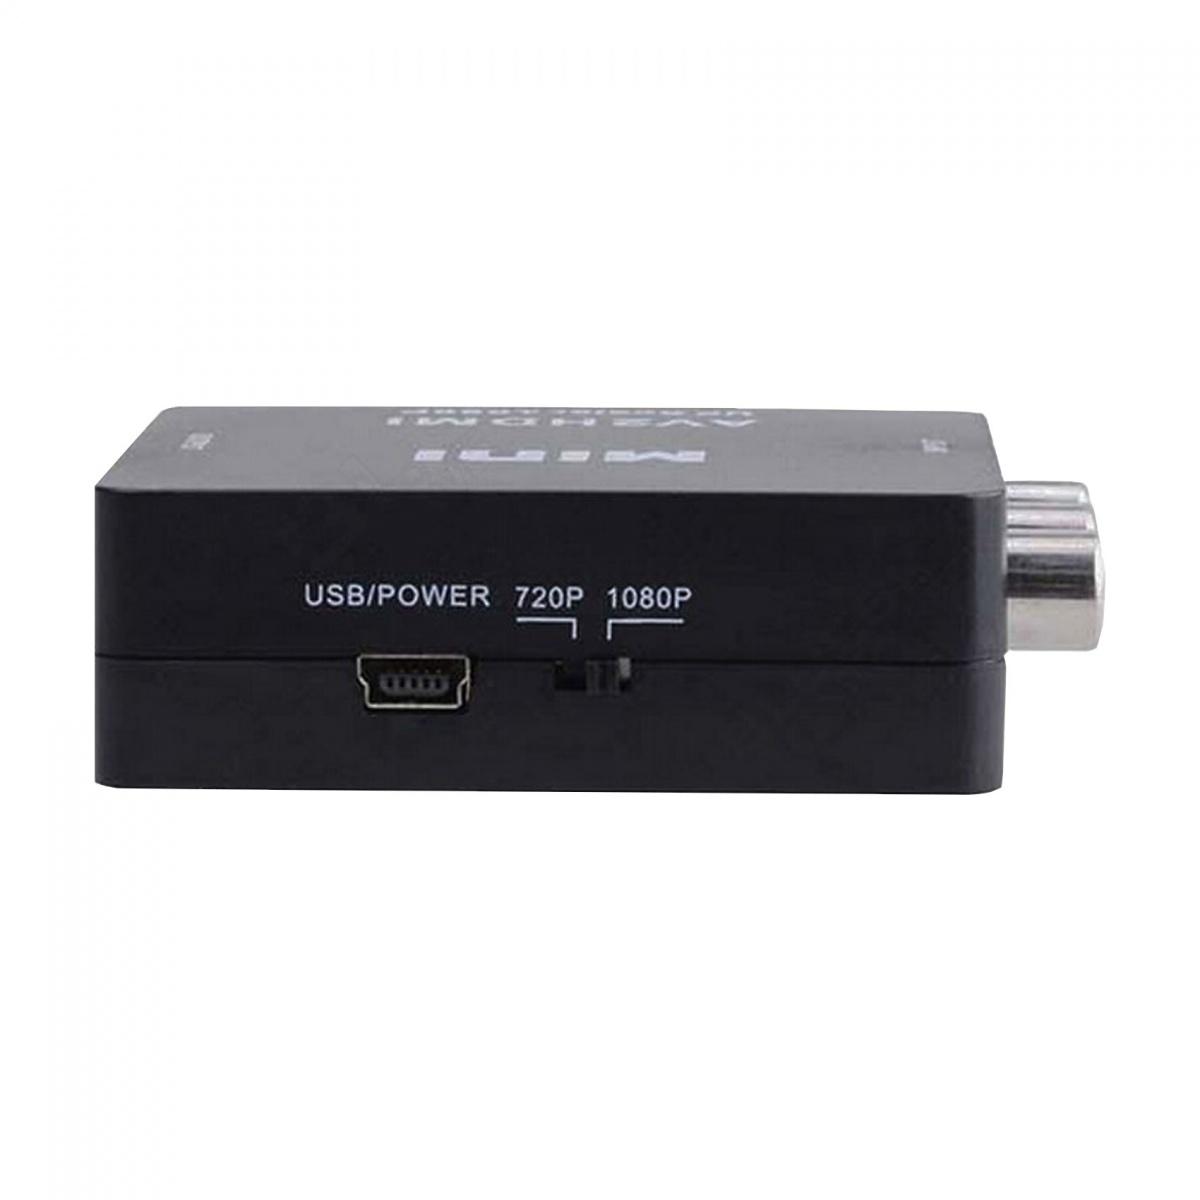 Mini AV2HDMI UP Scaler RCA T0 HDMI 1080P Video Converter Box - Black